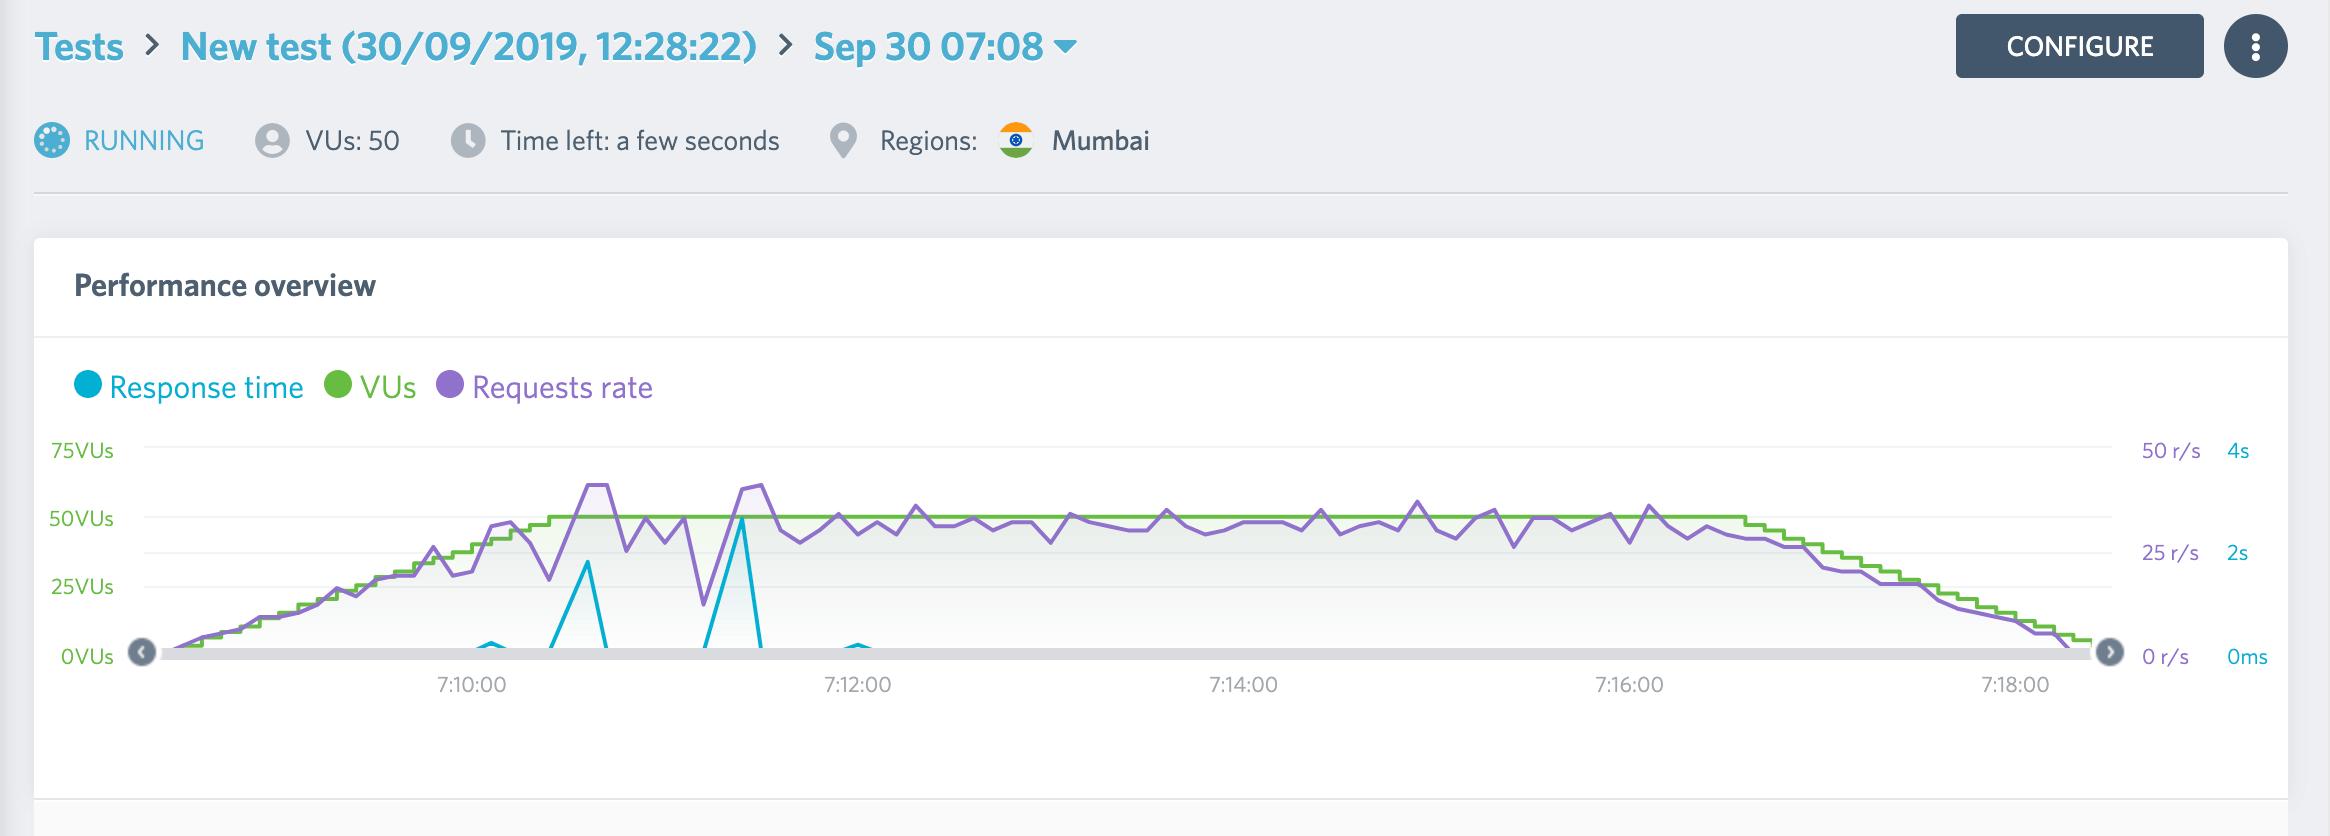 MilesWeb Load Impact Test 50 VU